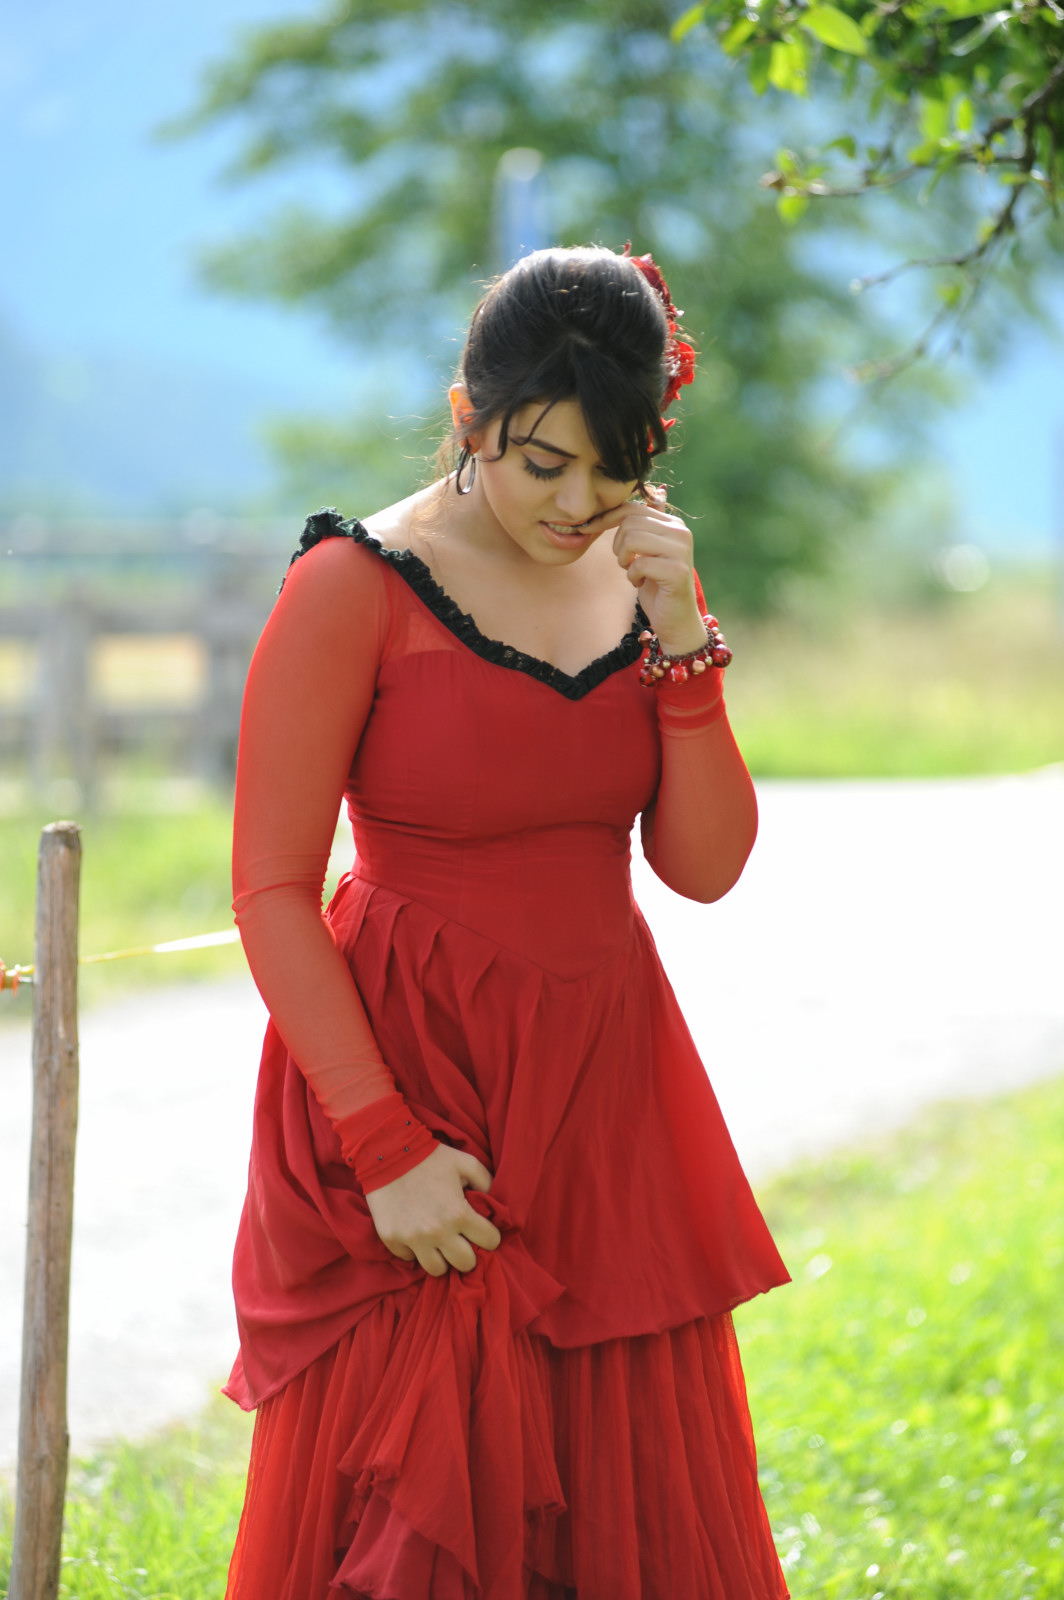 http://3.bp.blogspot.com/-bP8Zhj8FnCk/TkehGJdNfFI/AAAAAAAAEY8/wH9TvebbAAI/s1600/Hansika-Motwani-wallpaper-nice_smile_long_legs_mily_legs%2B%25286%2529.jpg